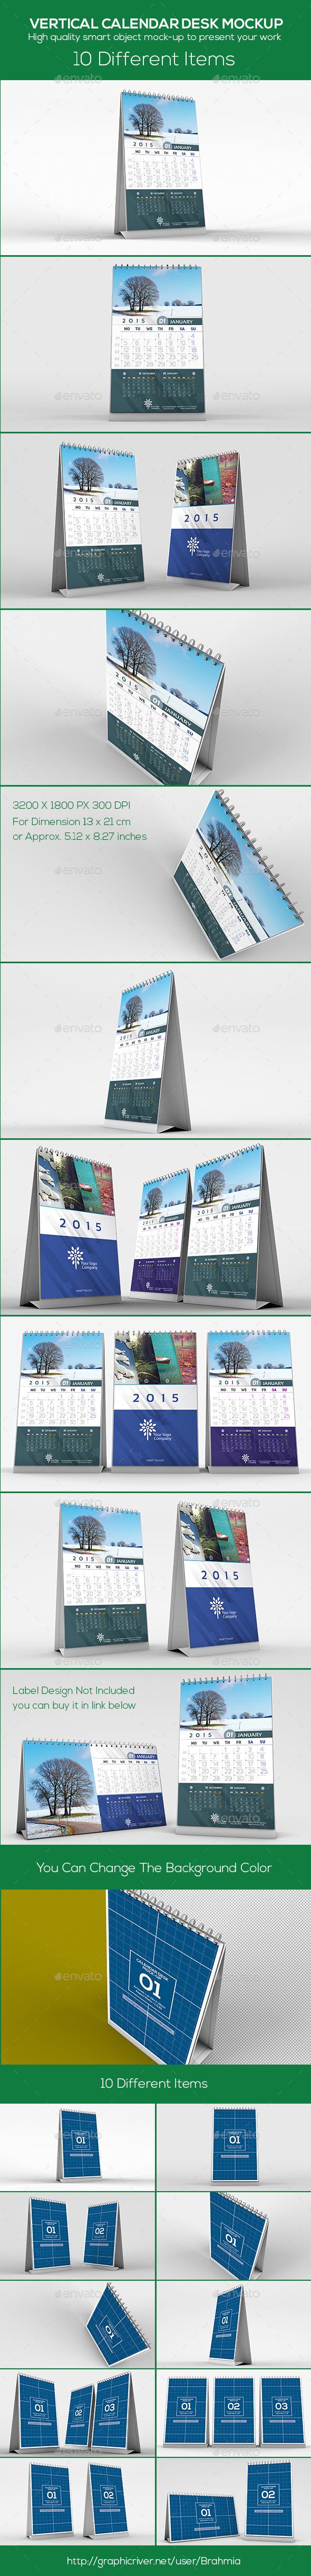 Vertical Calendar Desk Mockup - Miscellaneous Print